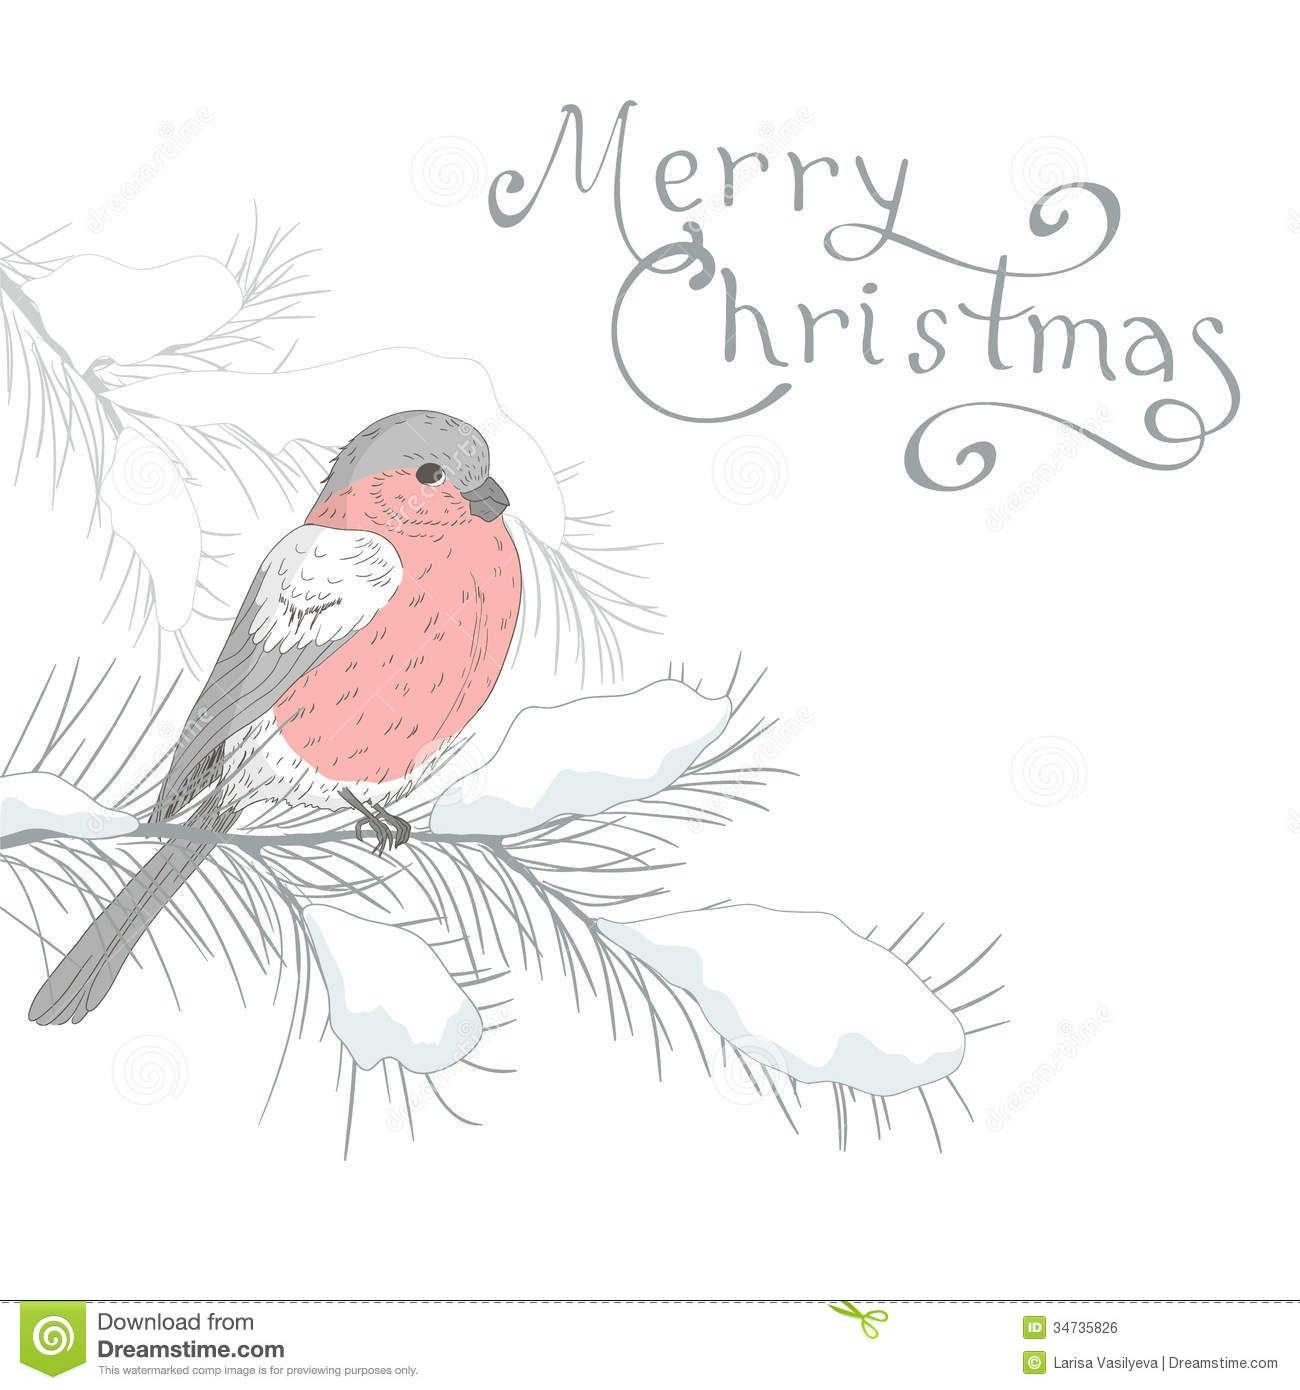 Greetingcardbirdchristmashanddrawbackgroundholidaywinter